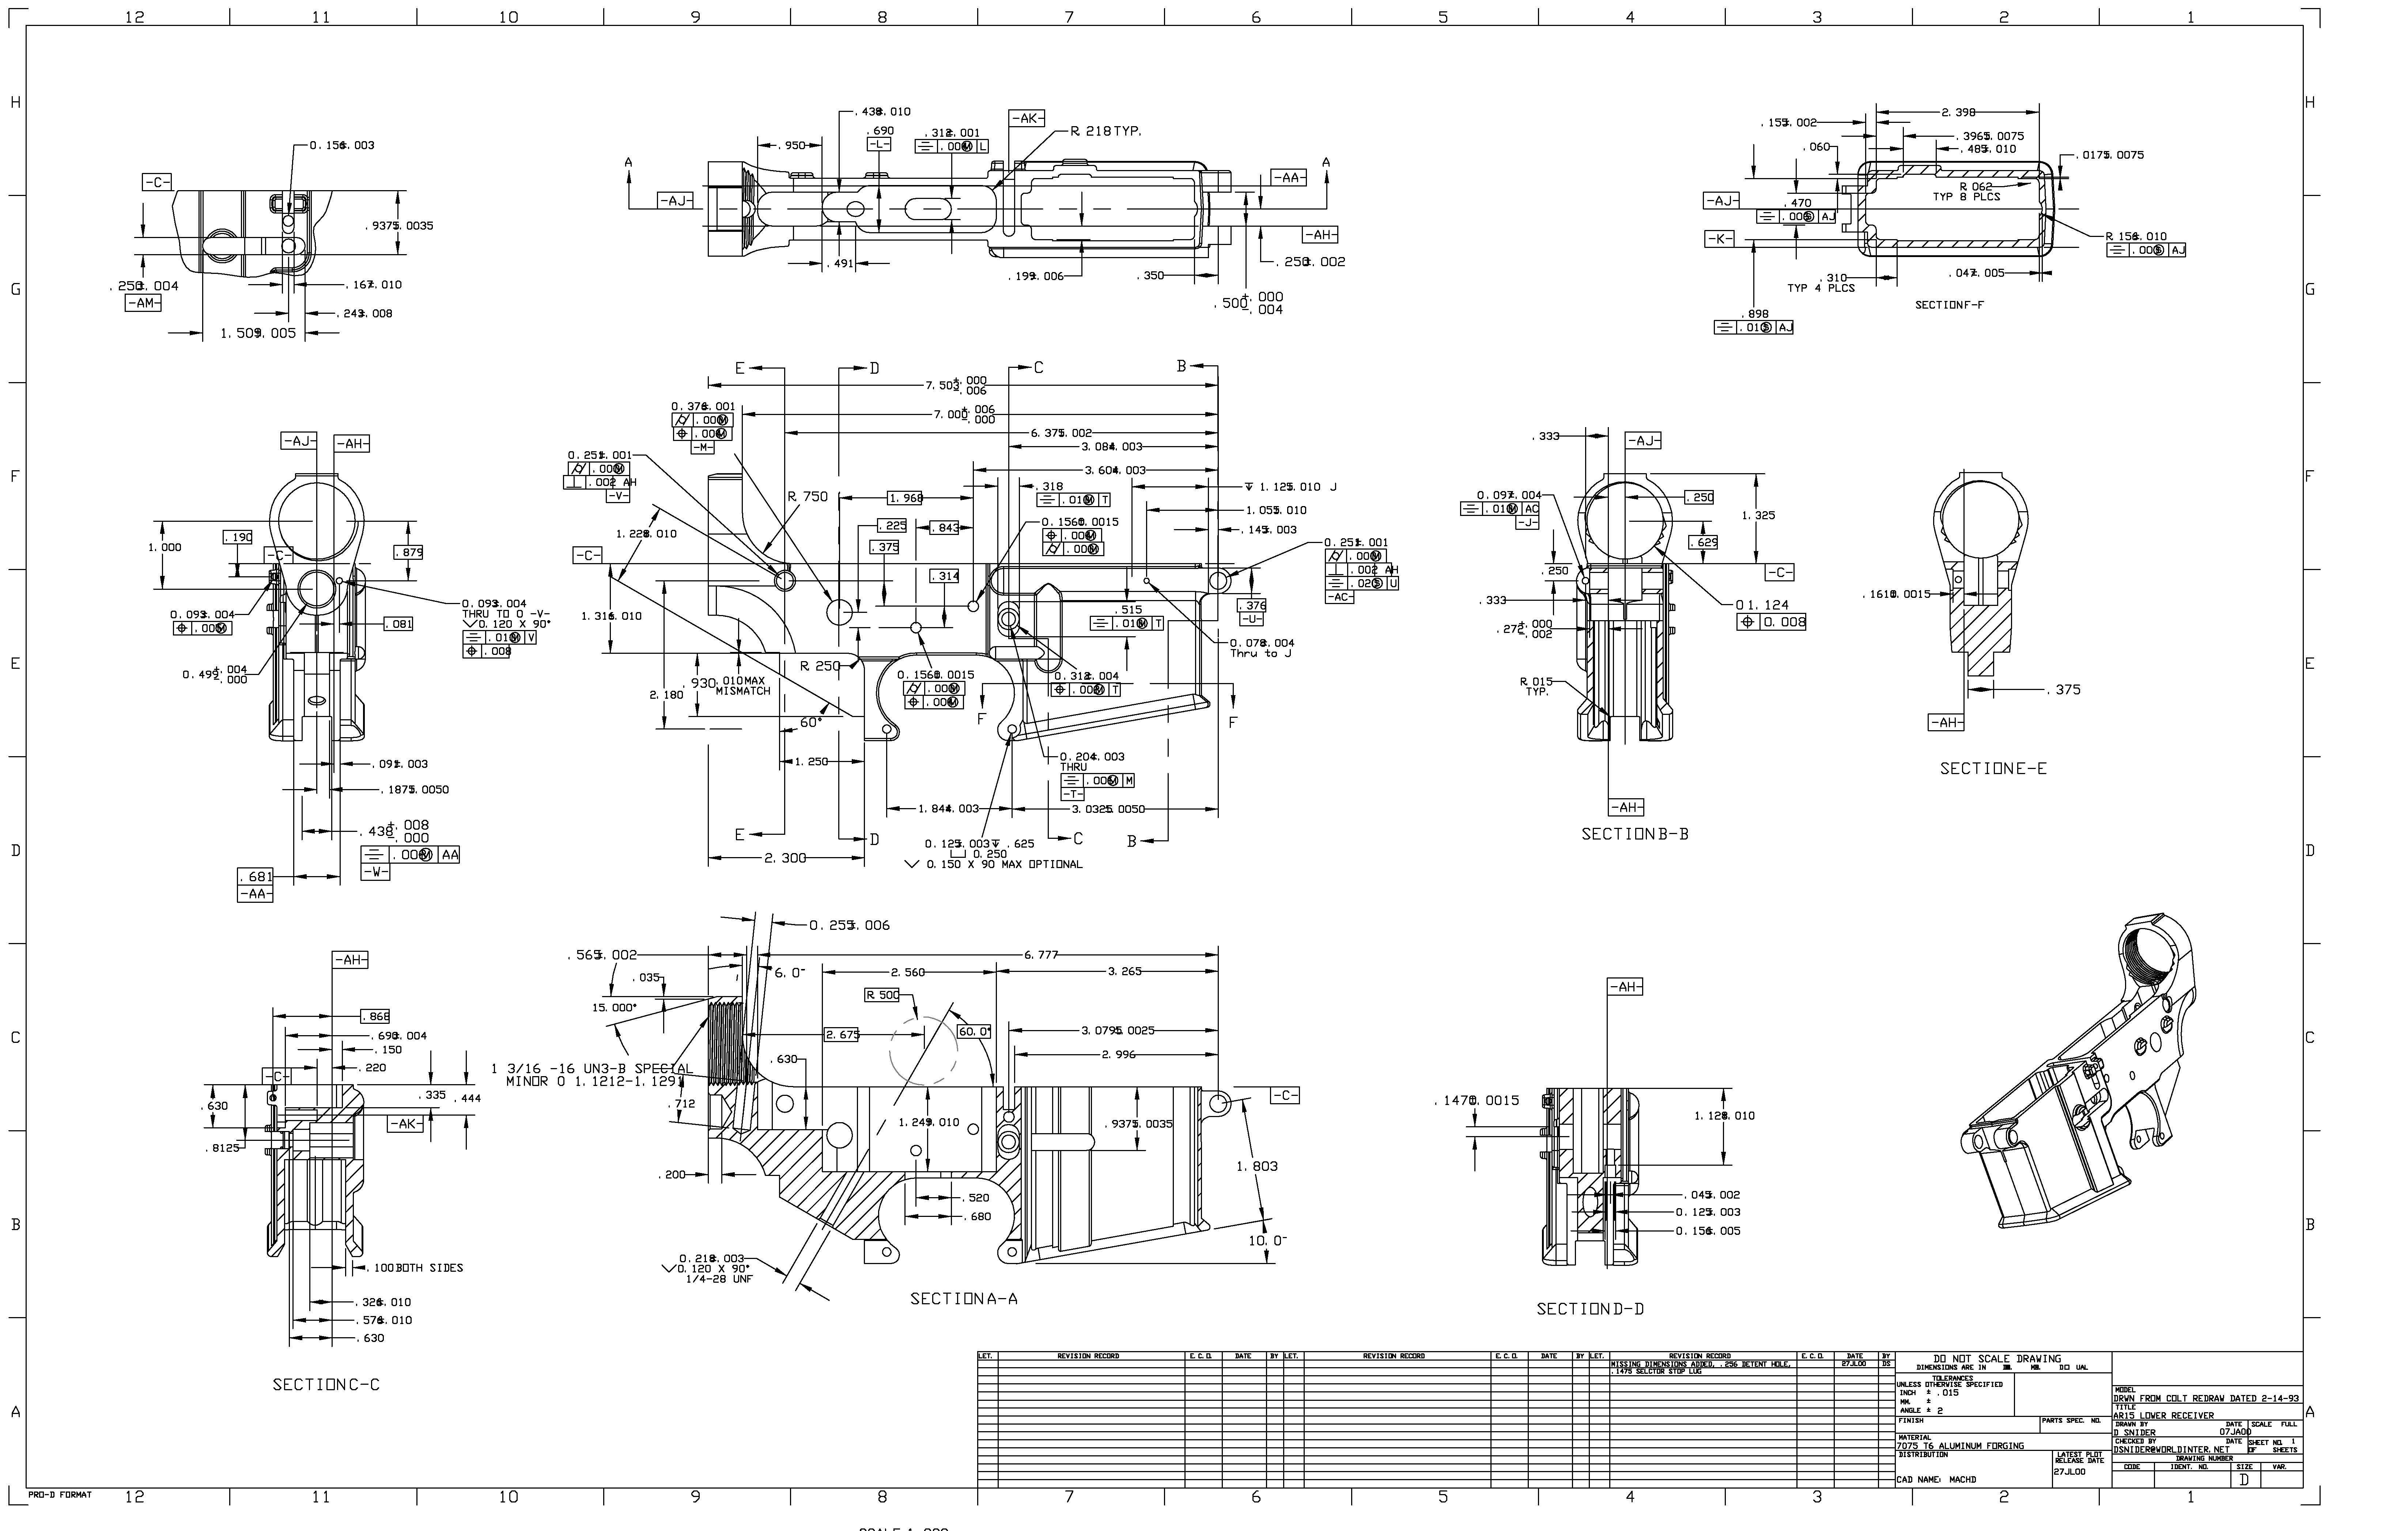 Pin on Technical Drawings & Cutaways